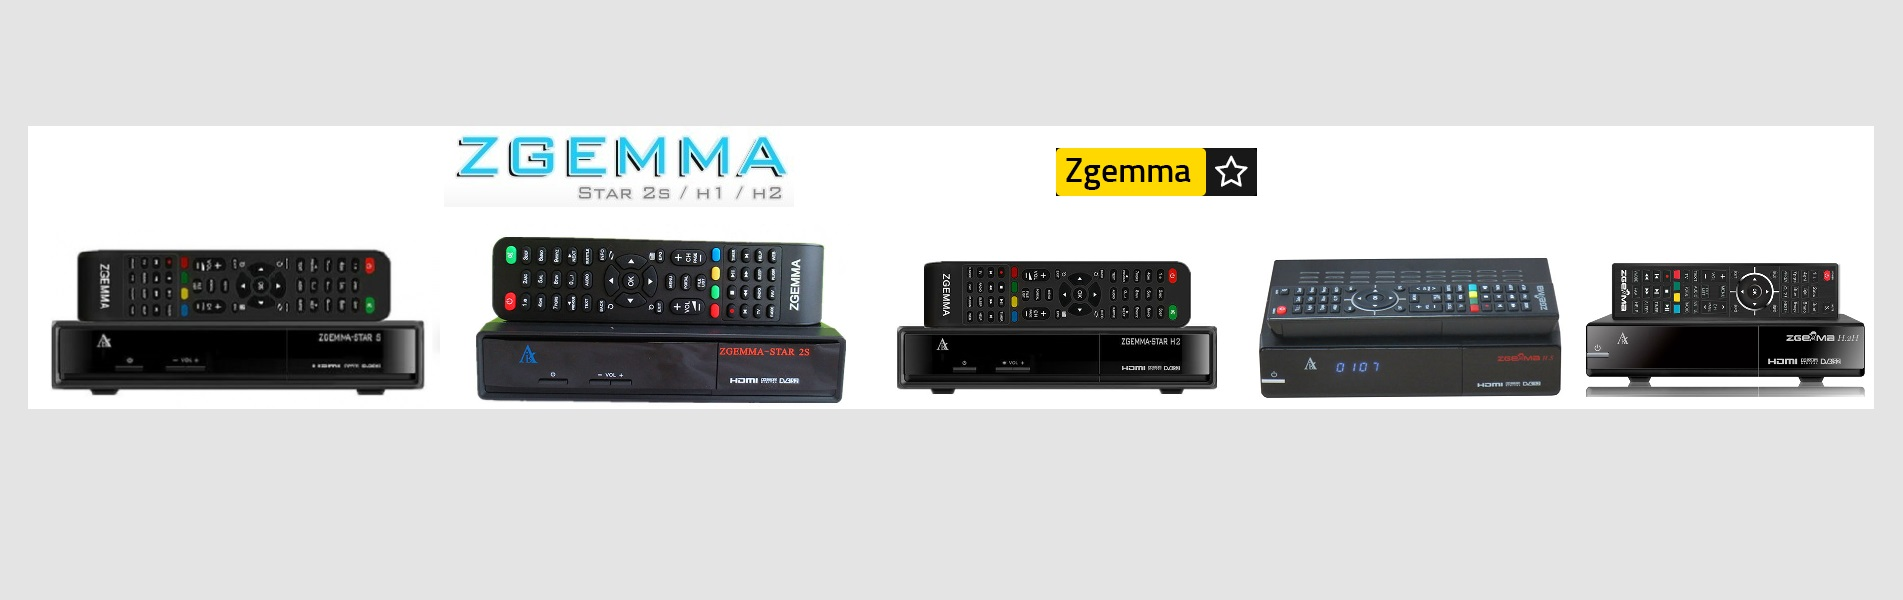 LinuxTv-Zgemma, IPTV, Jaddo Boxes